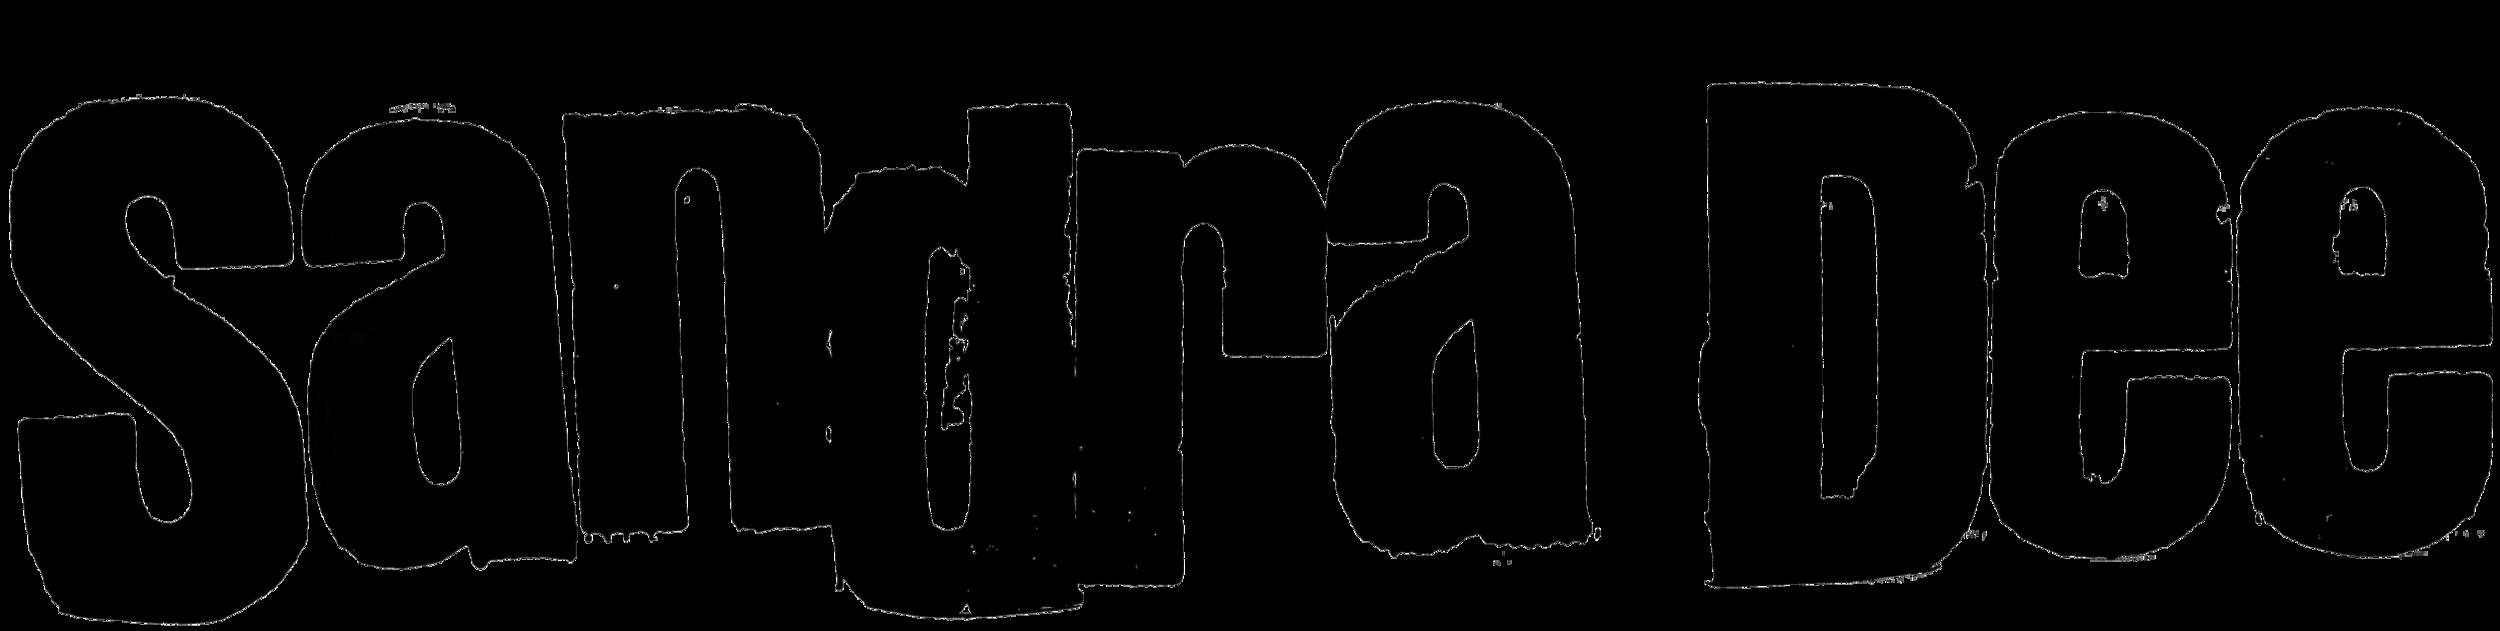 Sandra Dee Logo.png